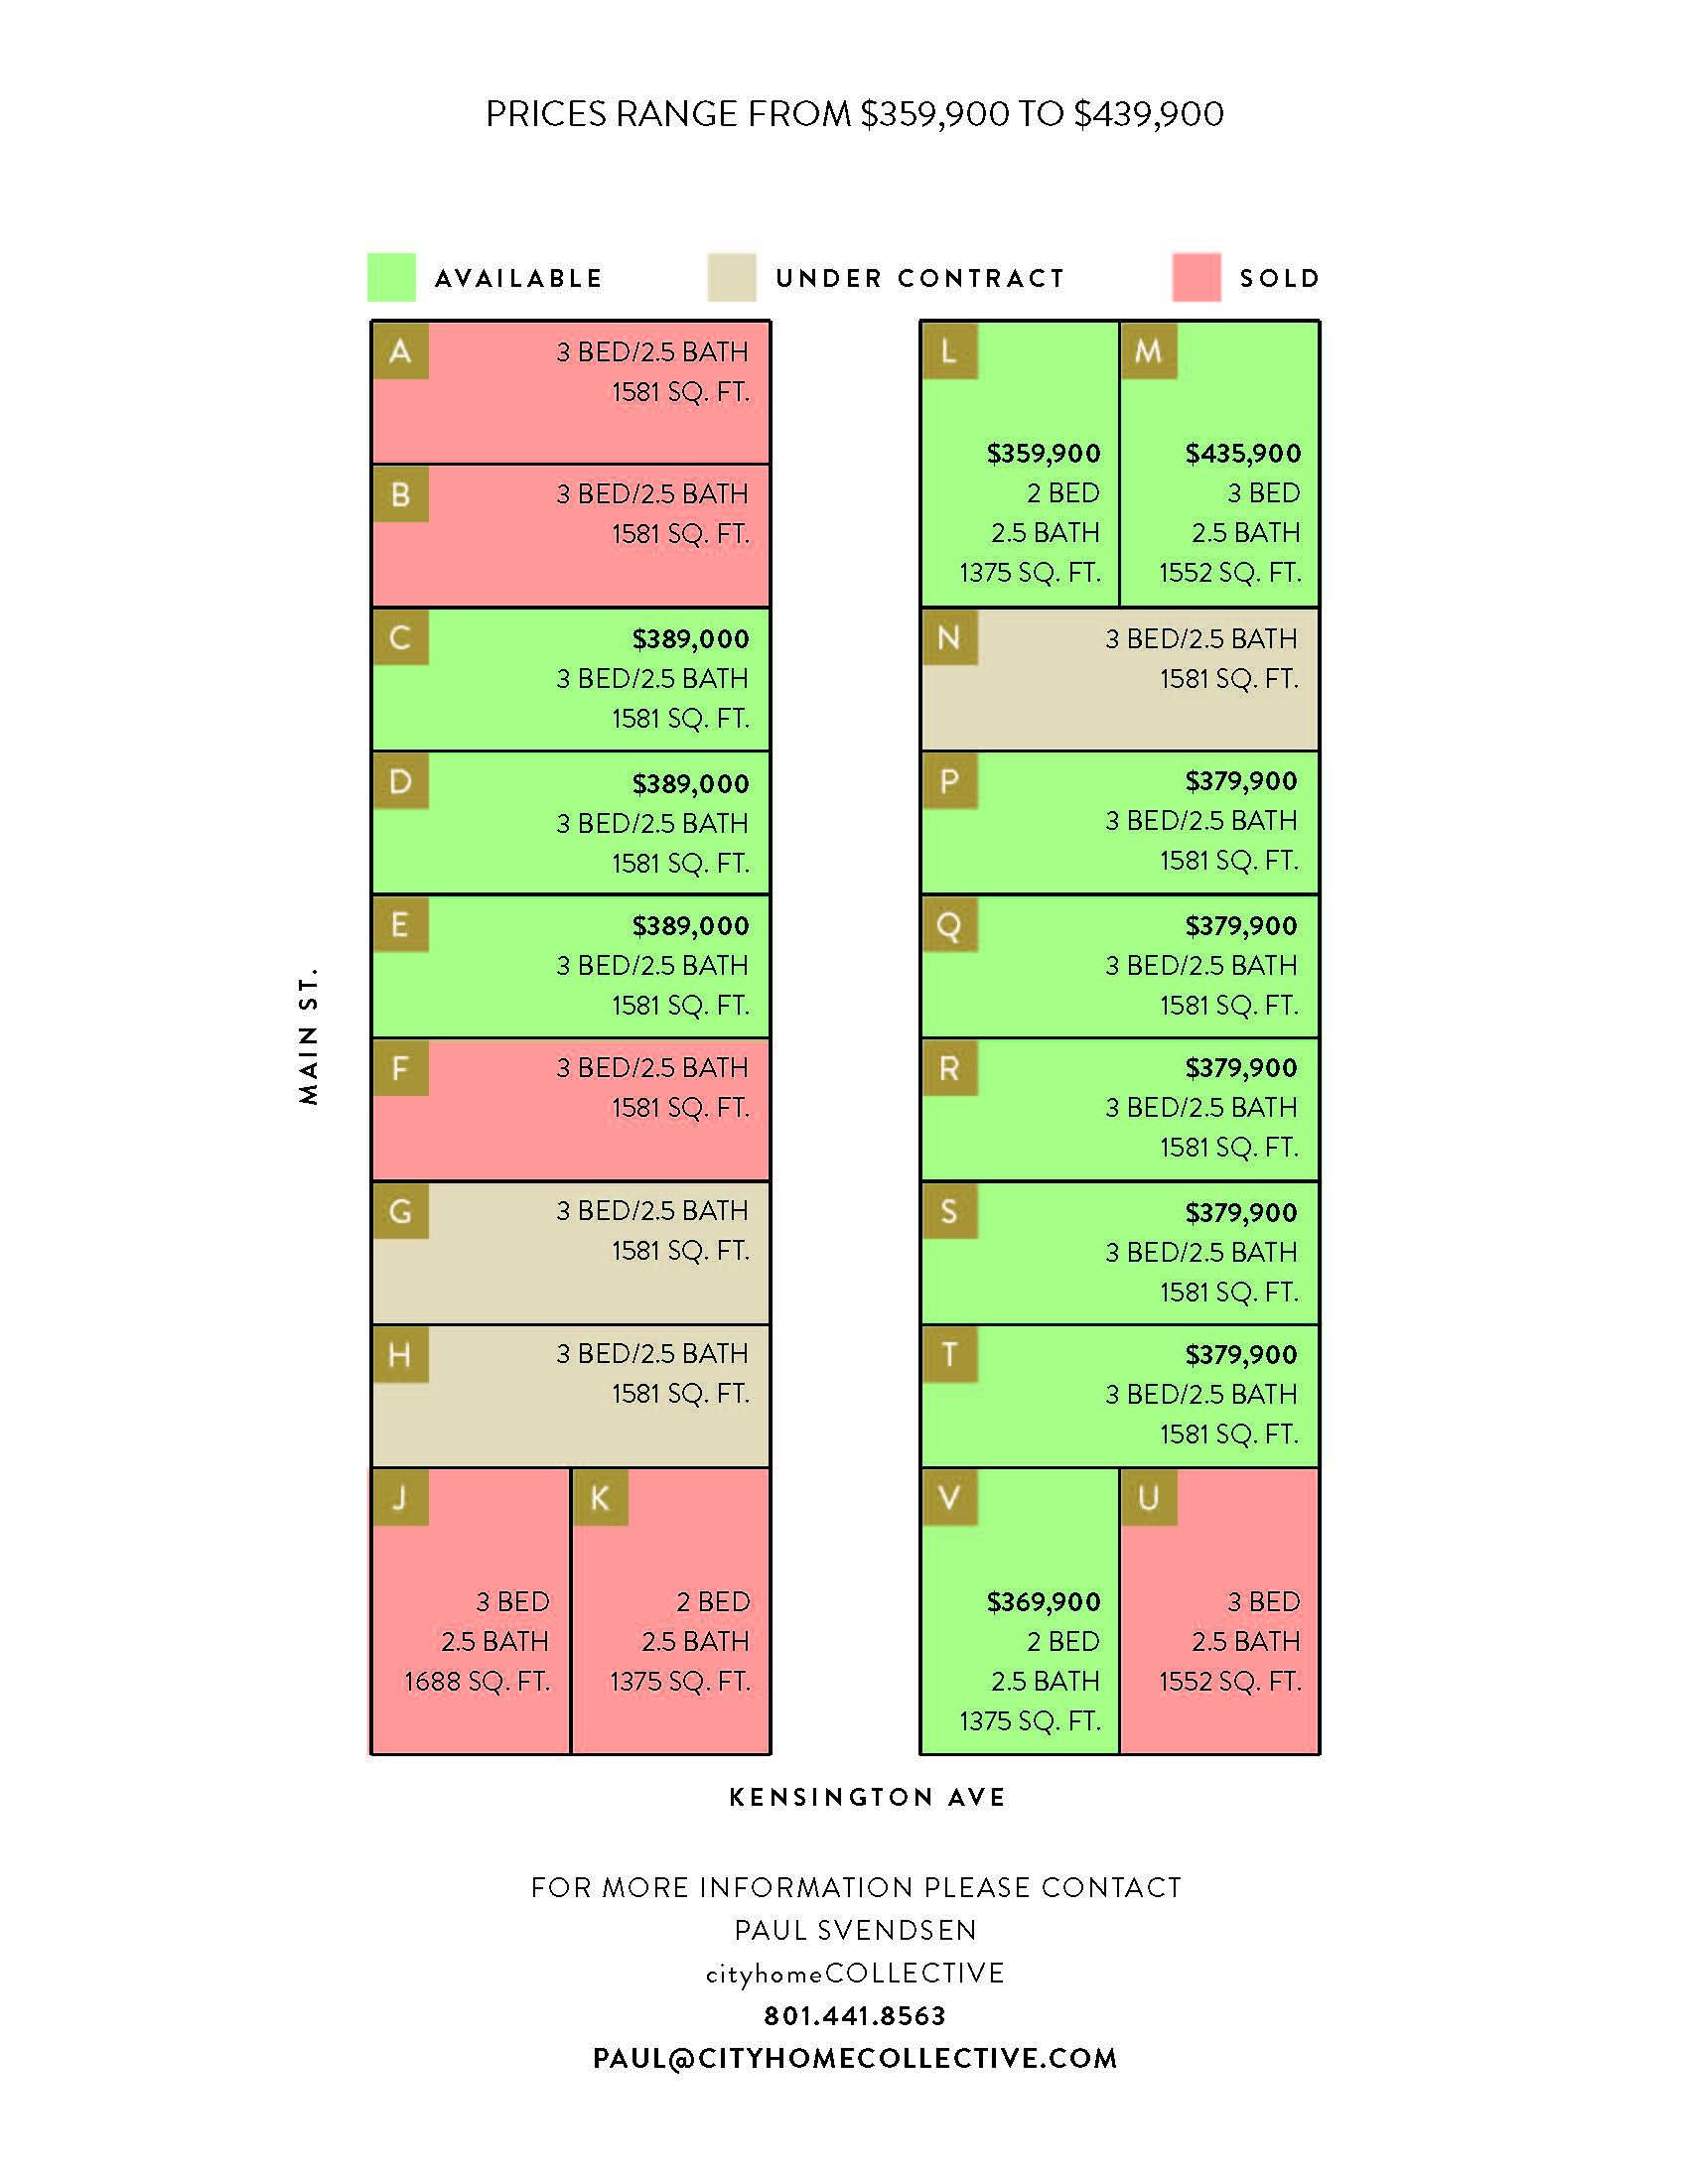 15_main_price_sheet_7-8-19 2.jpg